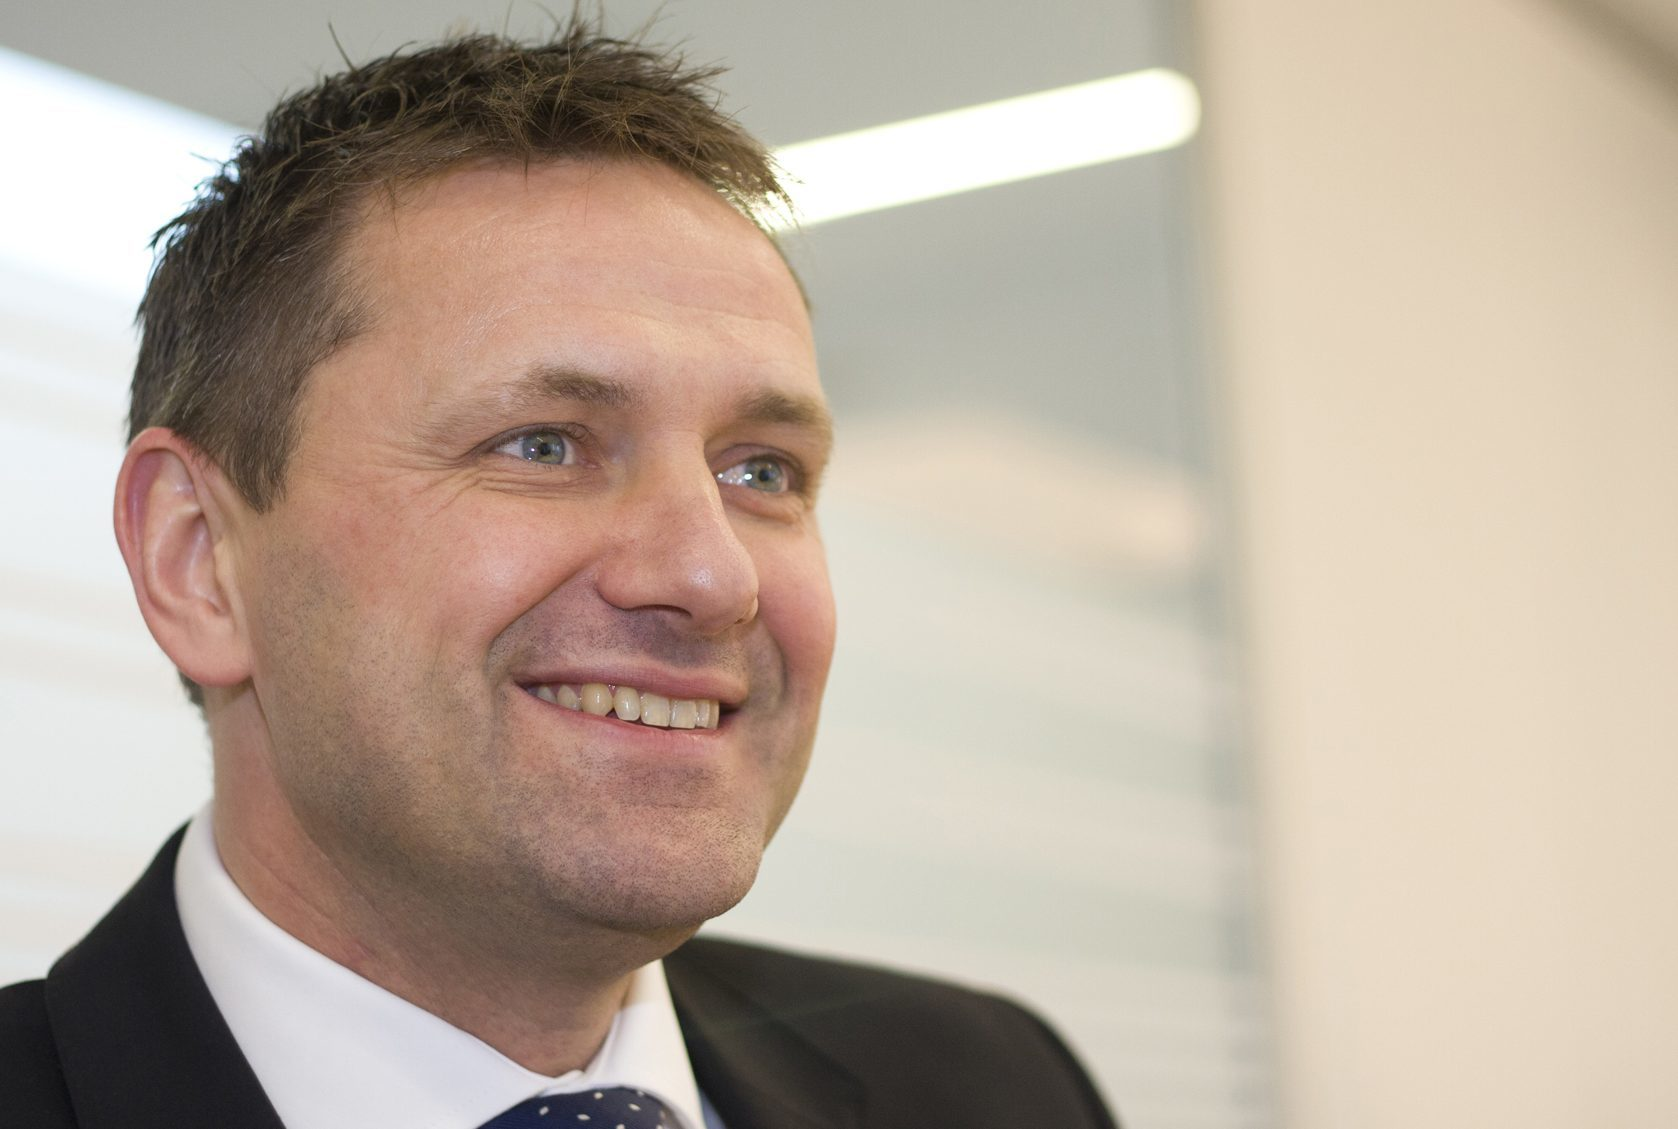 Alliance Trust Savings chief executive Patrick Mill